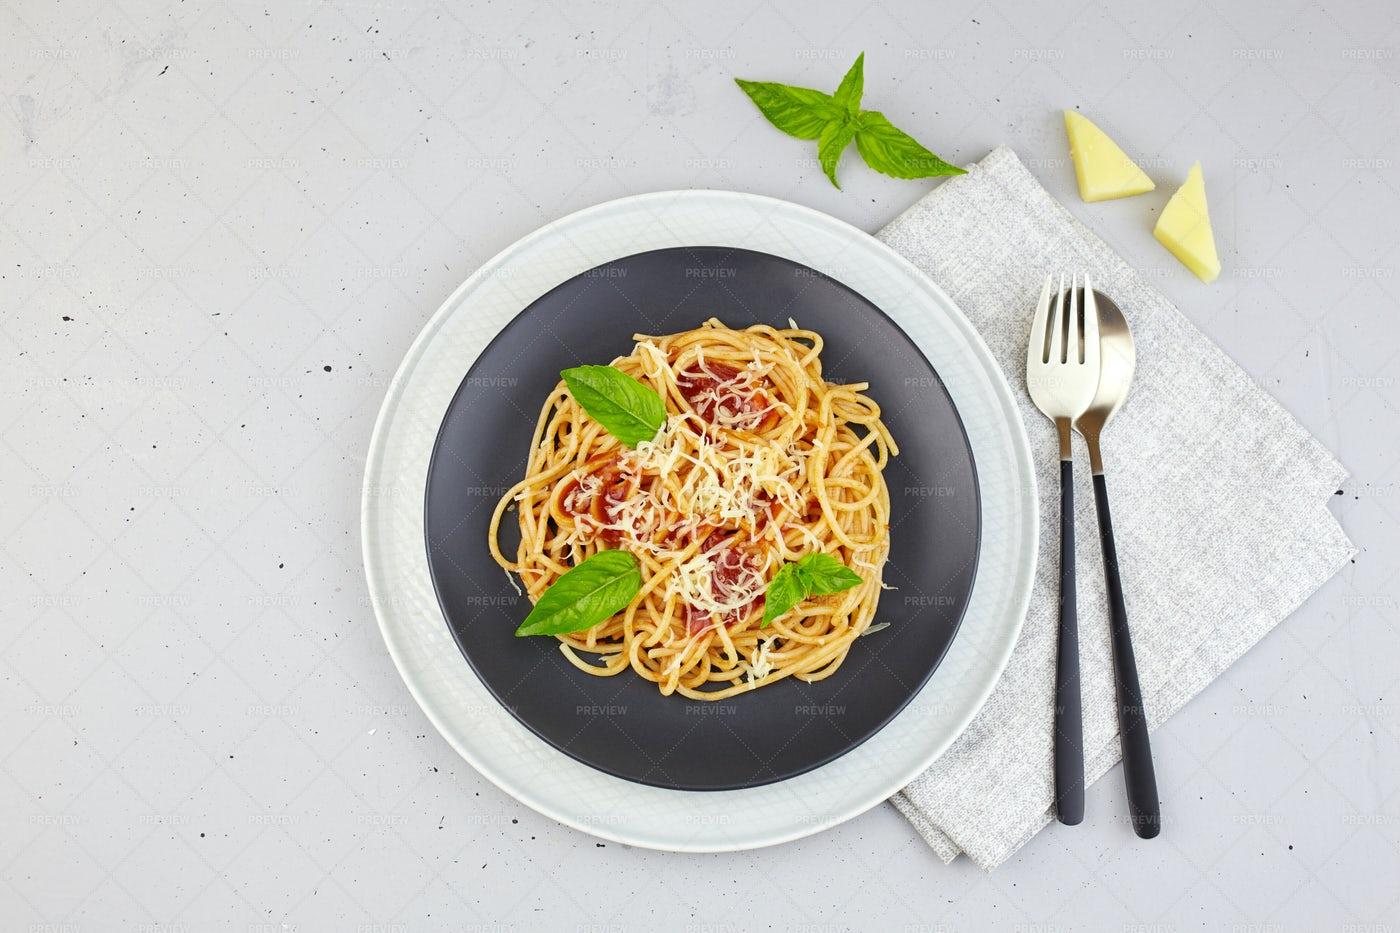 Gray Plate Of Pasta: Stock Photos